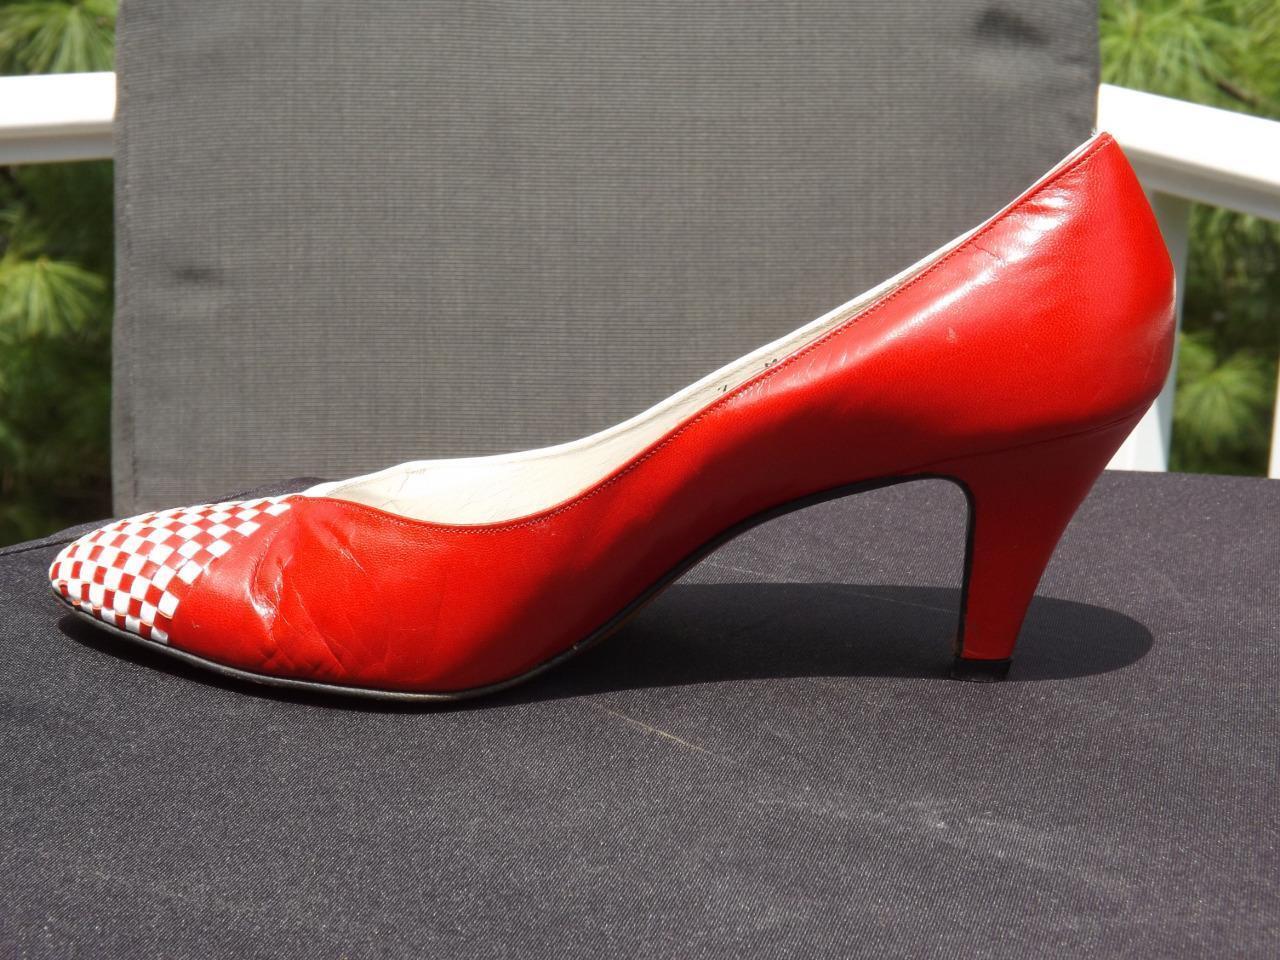 Bally of Switzerland ROT & WEISS Leder Lisa Pumps High Heels Ponte Shank 7 M